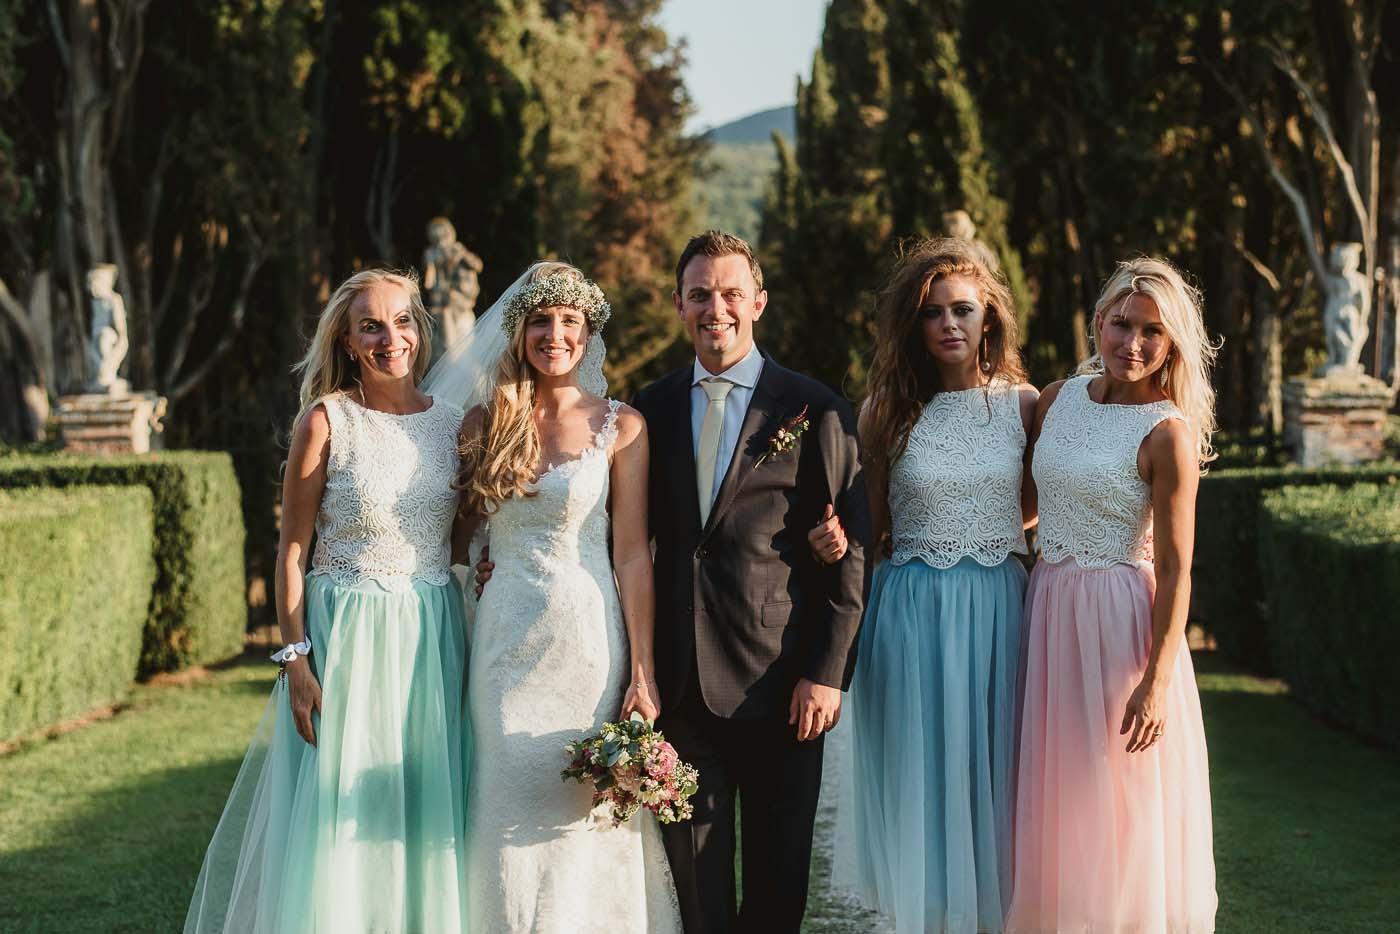 Relaxed-wedding-borgo-stomennano-1149